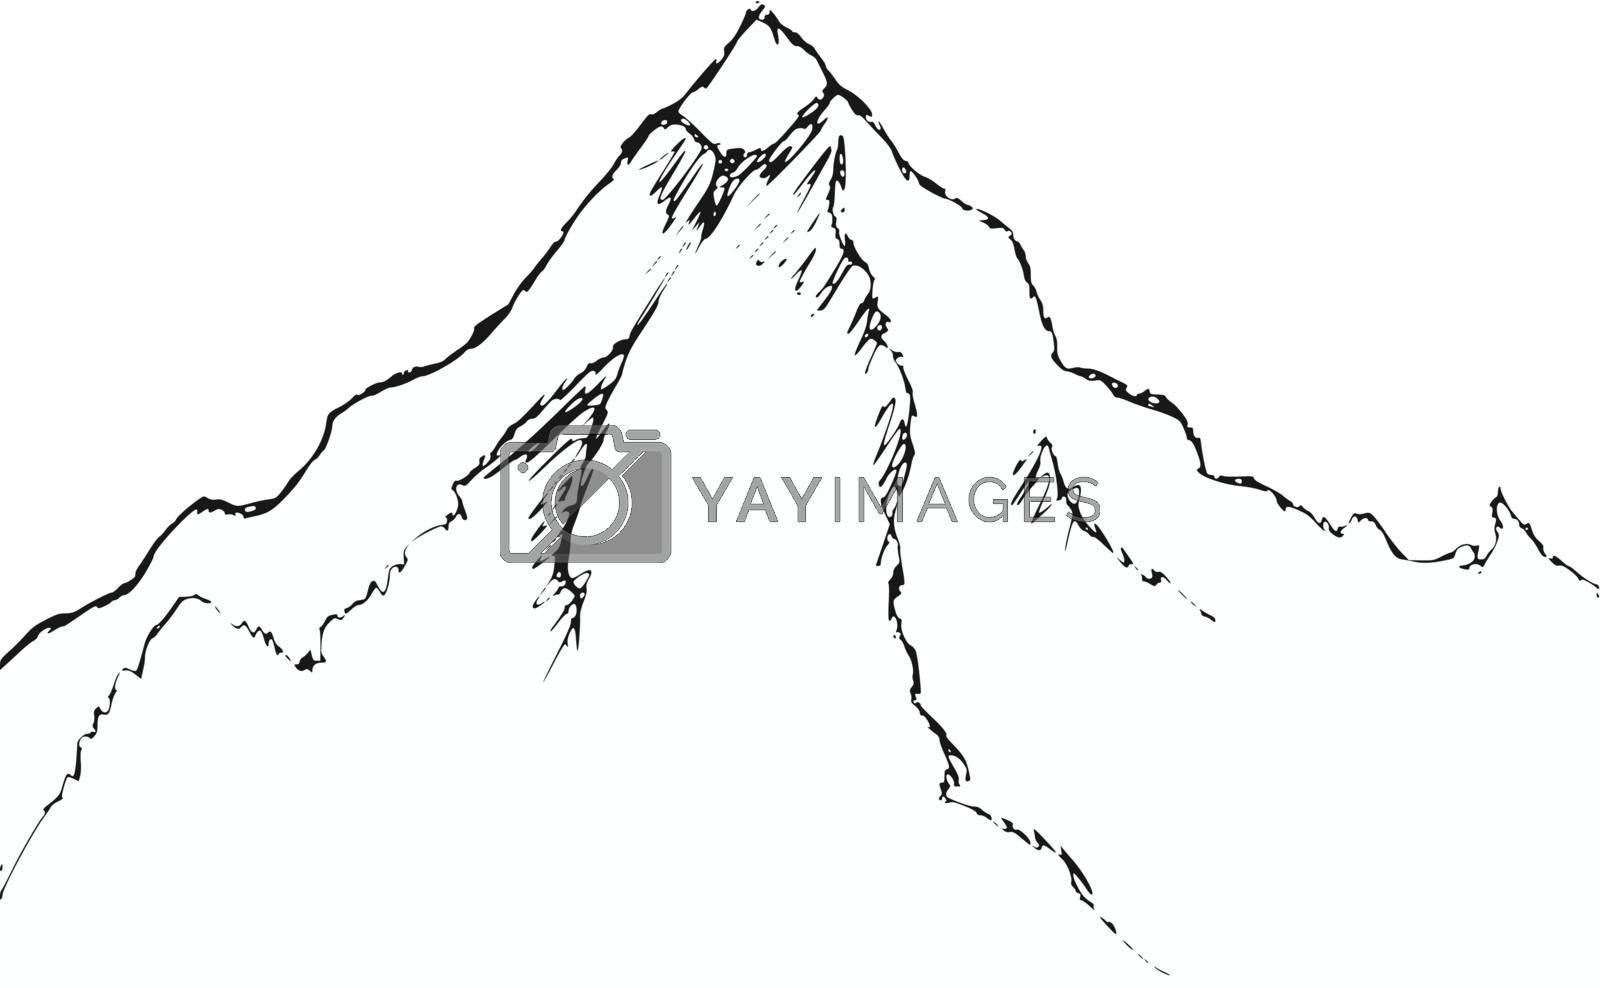 hand drawn, cartoon, sketch illustration of mountain